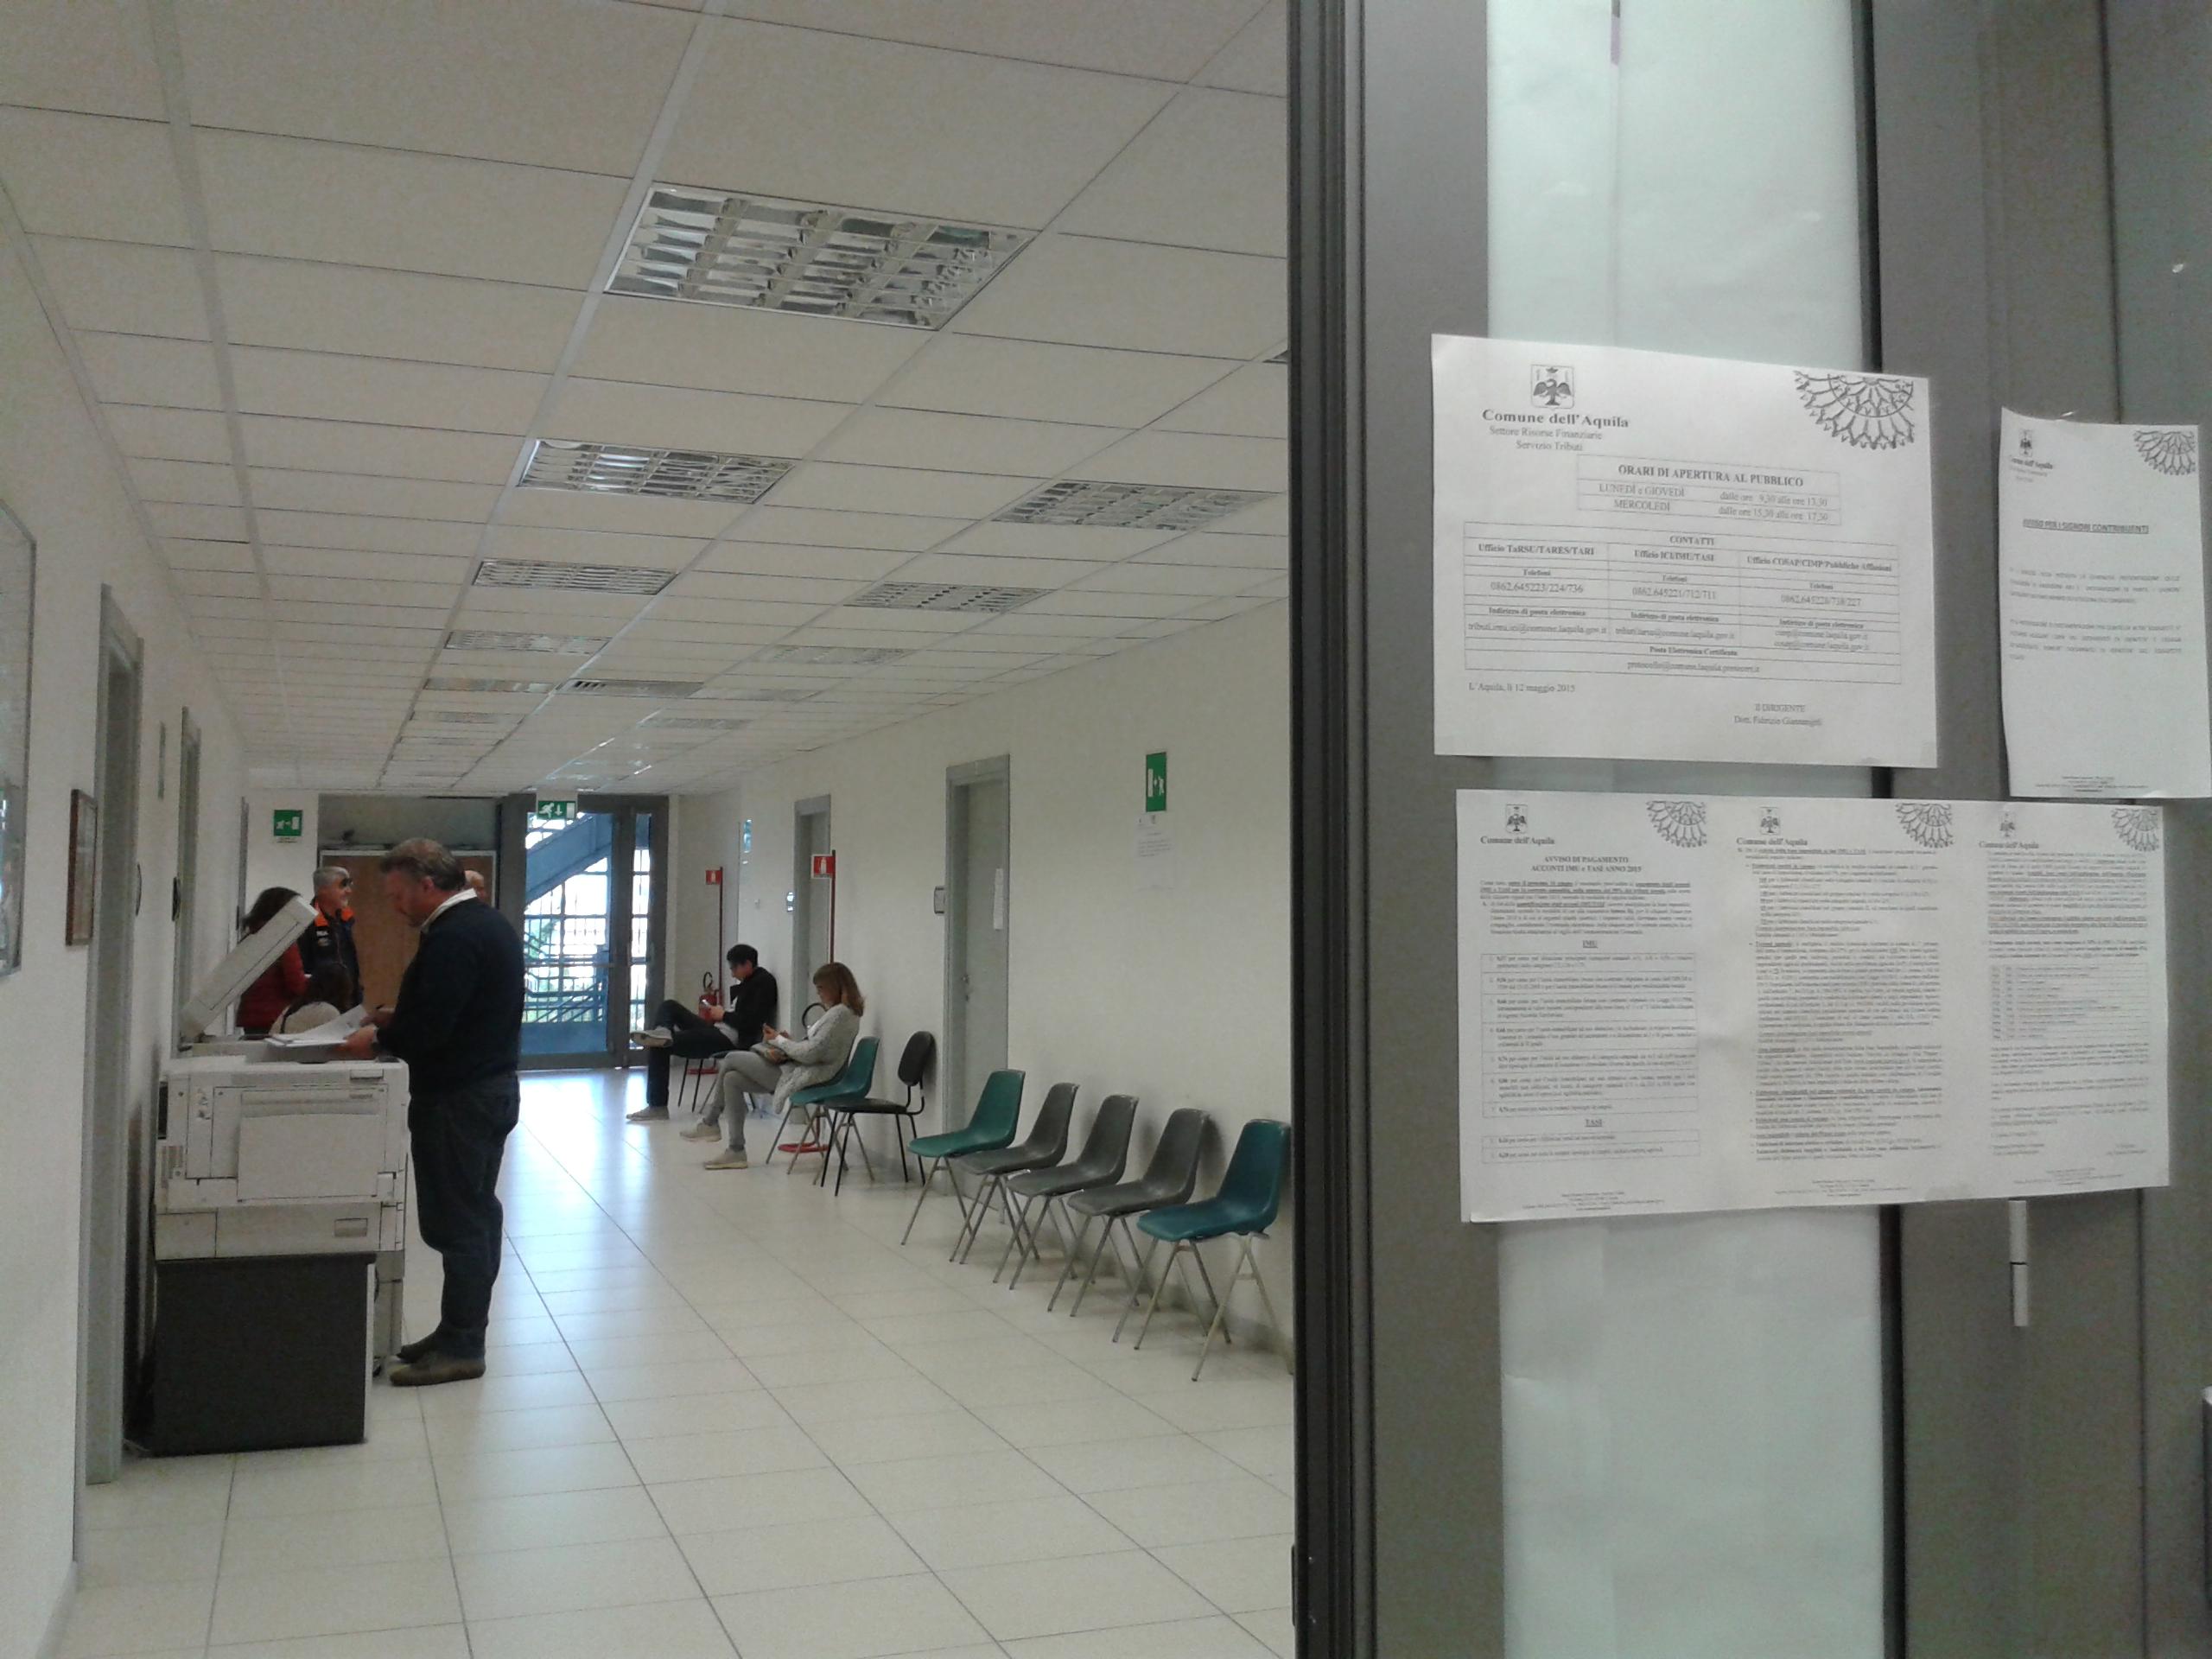 L'Aquila: tour negli uffici in tilt senza i 56 precari